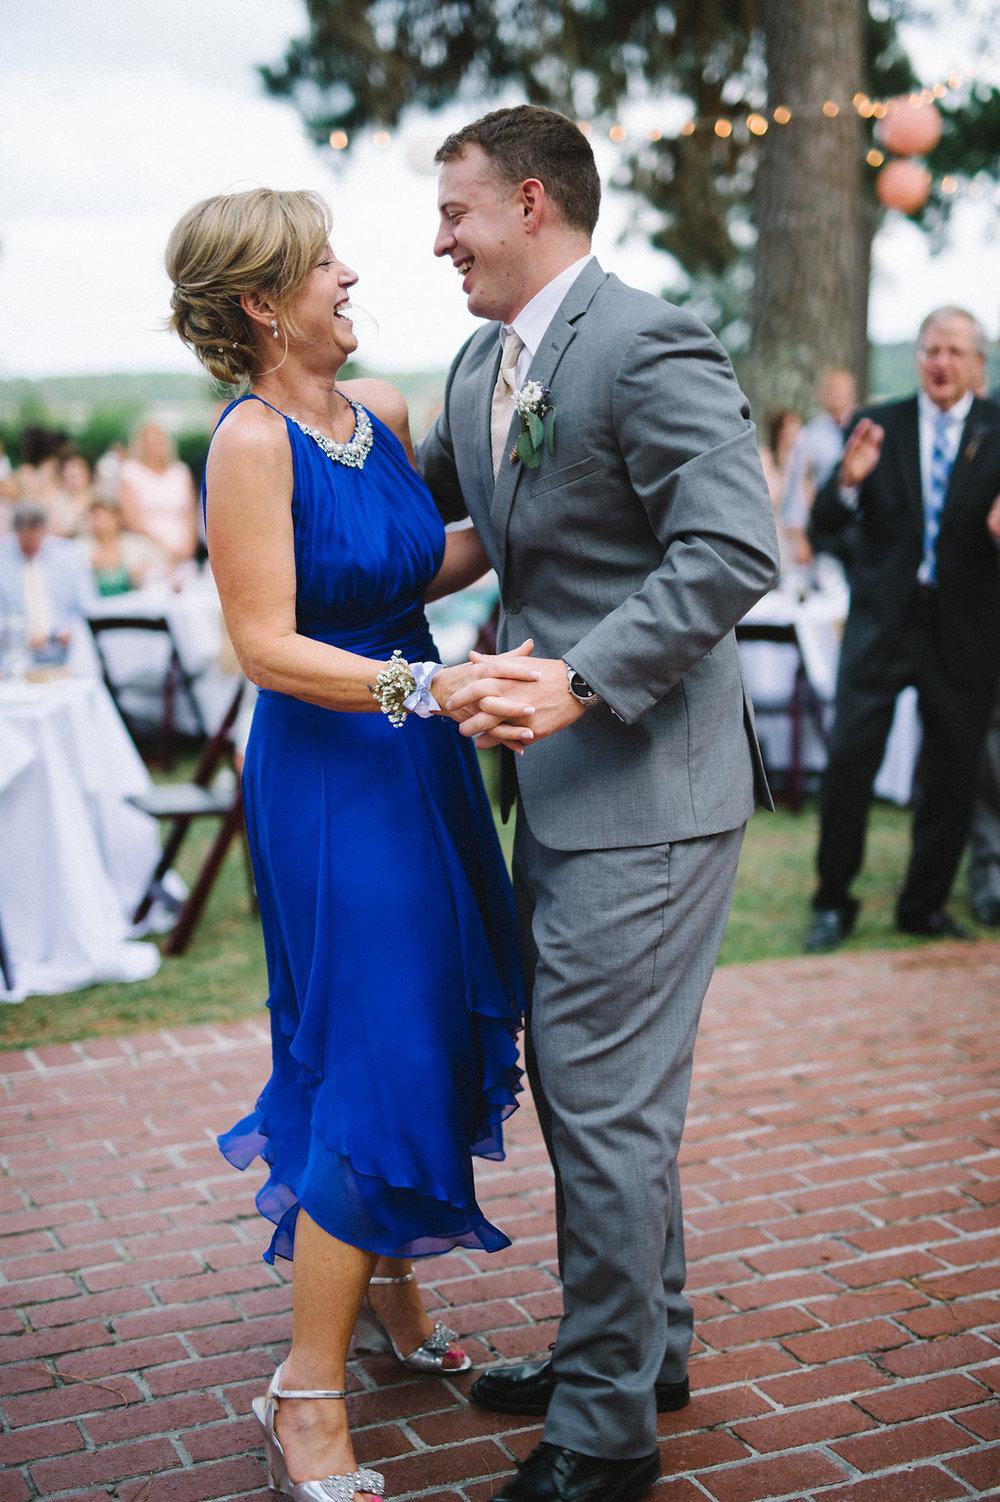 meagan-and-brenden-rach-loves-troy-photography-ivory-and-beau-bridal-boutqiue-ti-adora-wedding-dress-gold-lace-wedding-dress-savannah-wedding-planner-savannah-weddings-oldfield-plantation-wedding-savannah-florist-49.jpg